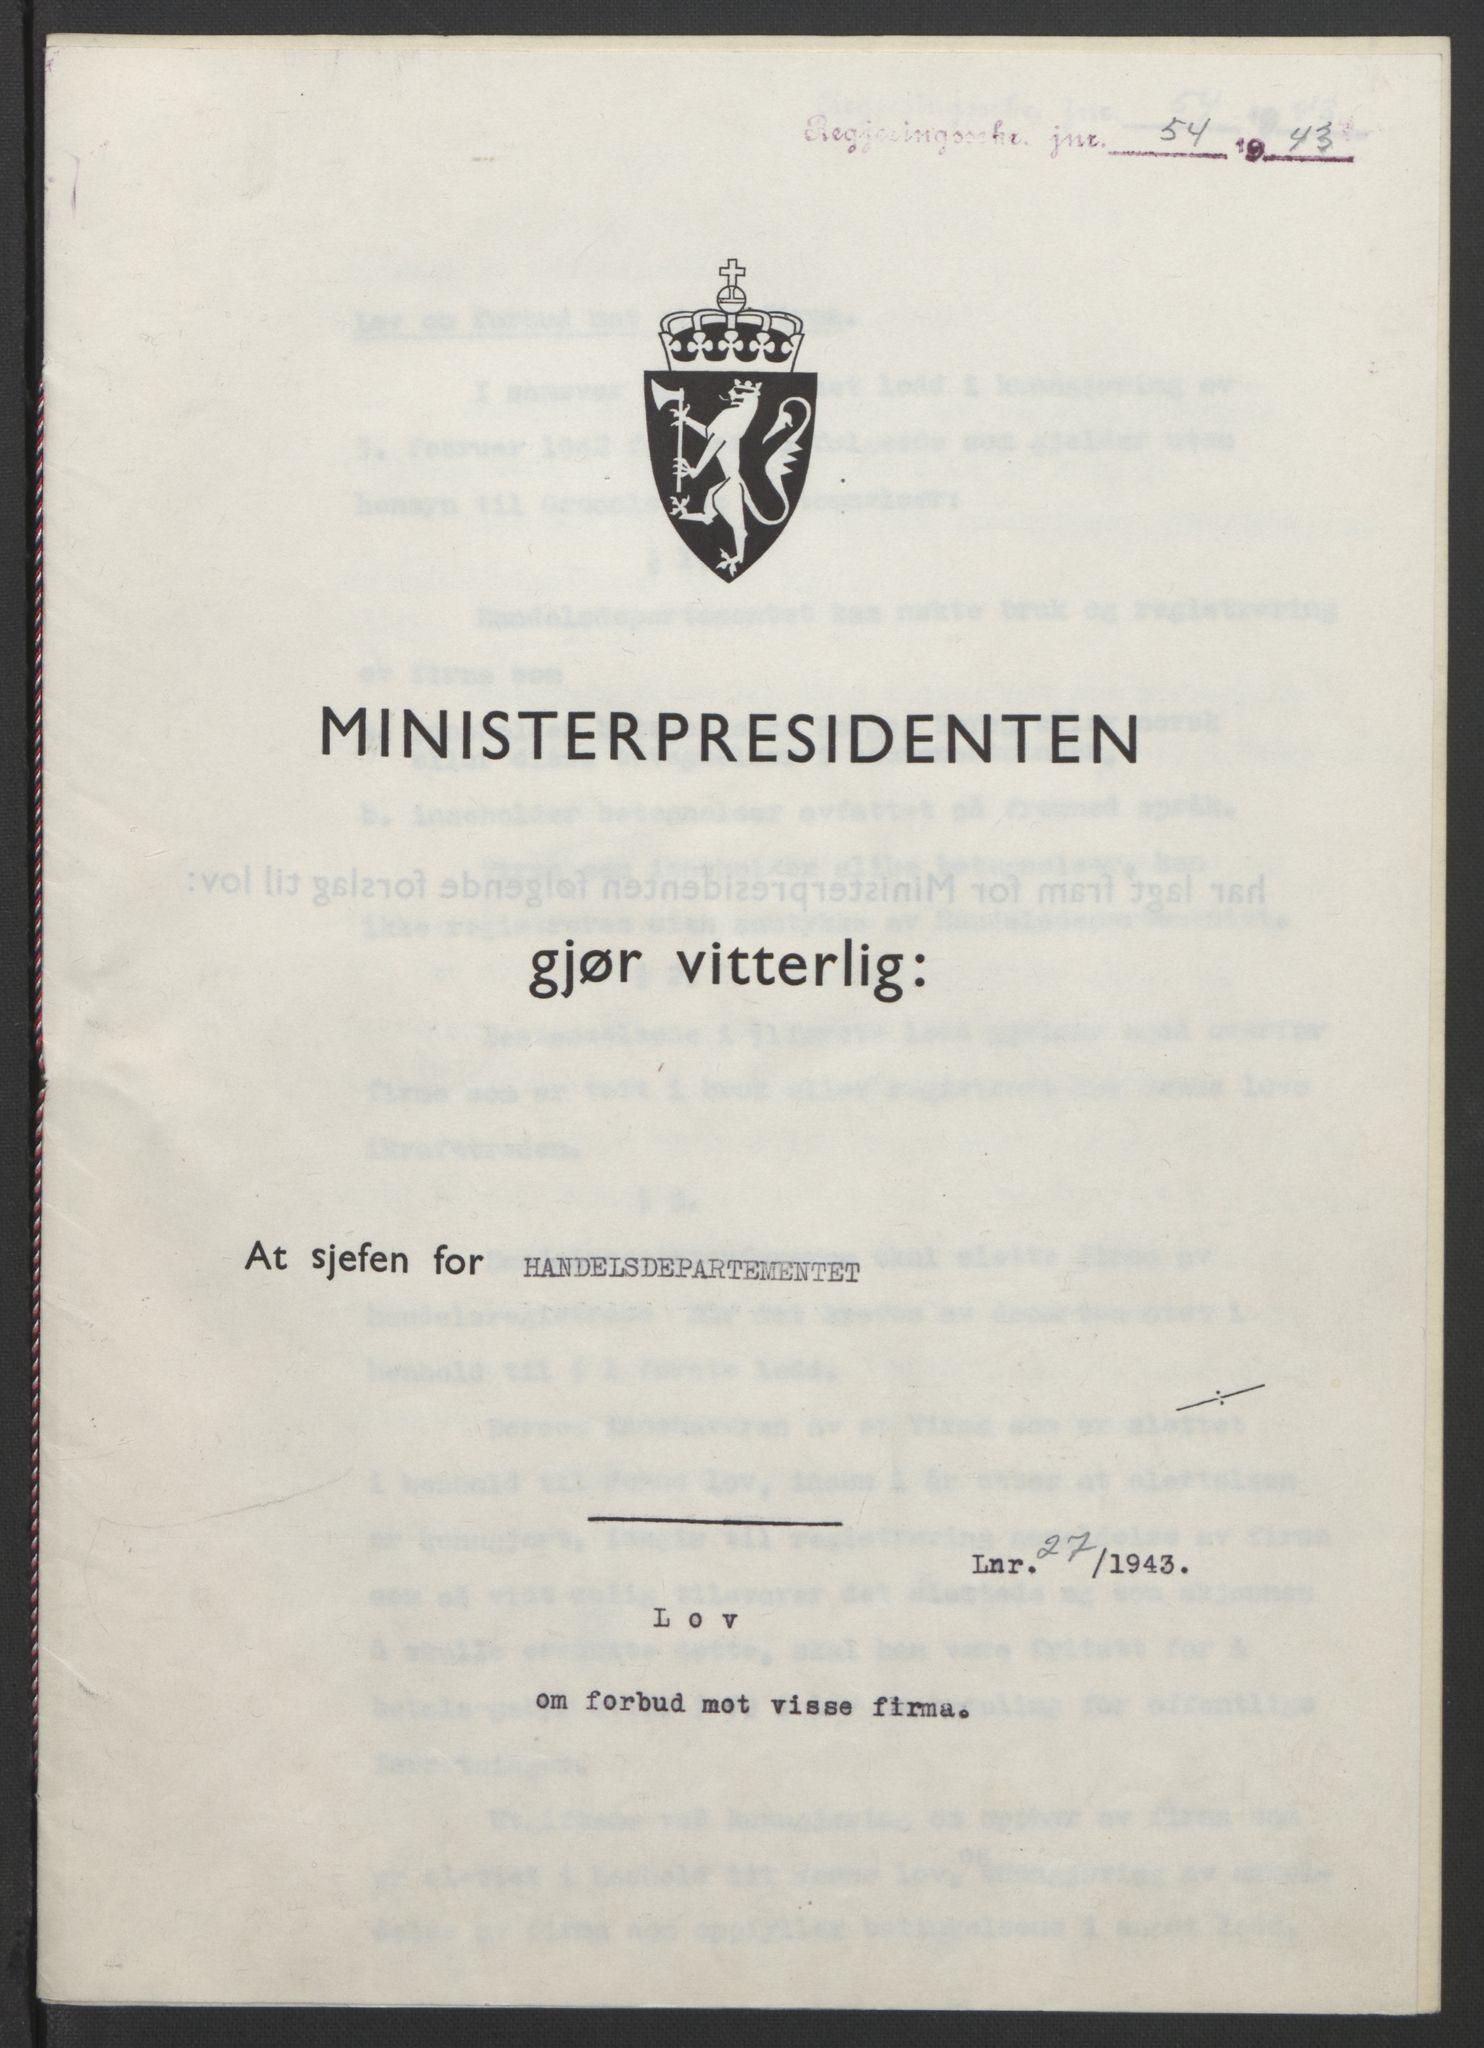 RA, NS-administrasjonen 1940-1945 (Statsrådsekretariatet, de kommisariske statsråder mm), D/Db/L0099: Lover, 1943, s. 109